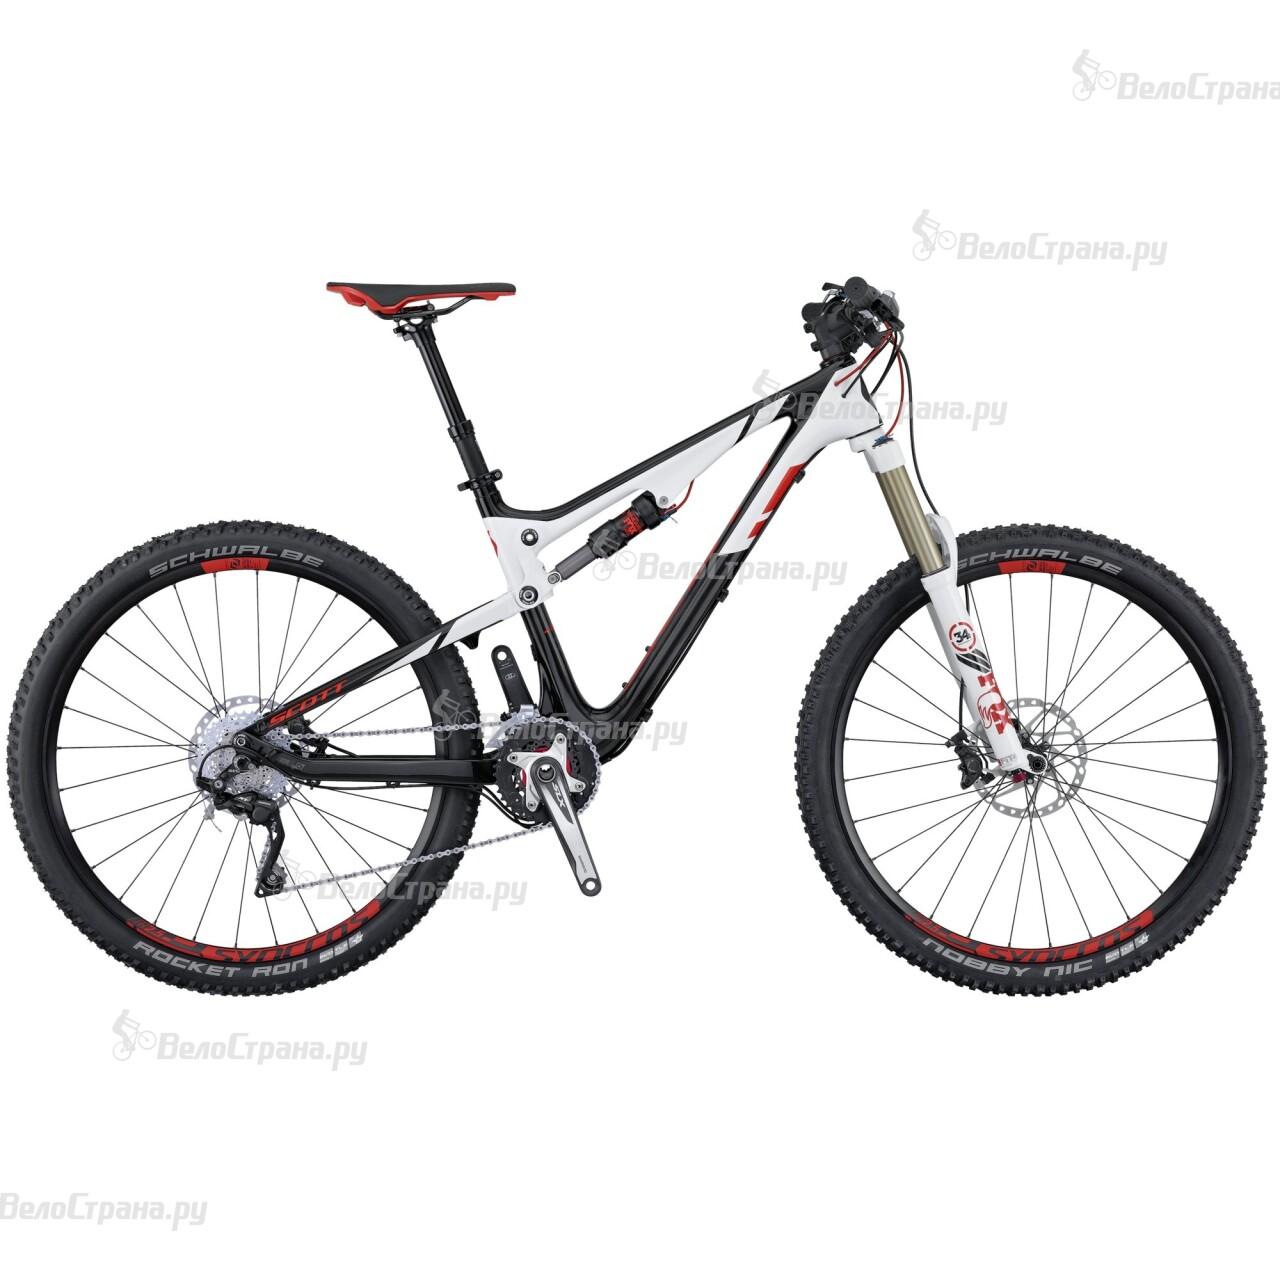 Велосипед Scott Genius 720 (2016) велосипед scott genius lt 720 2015